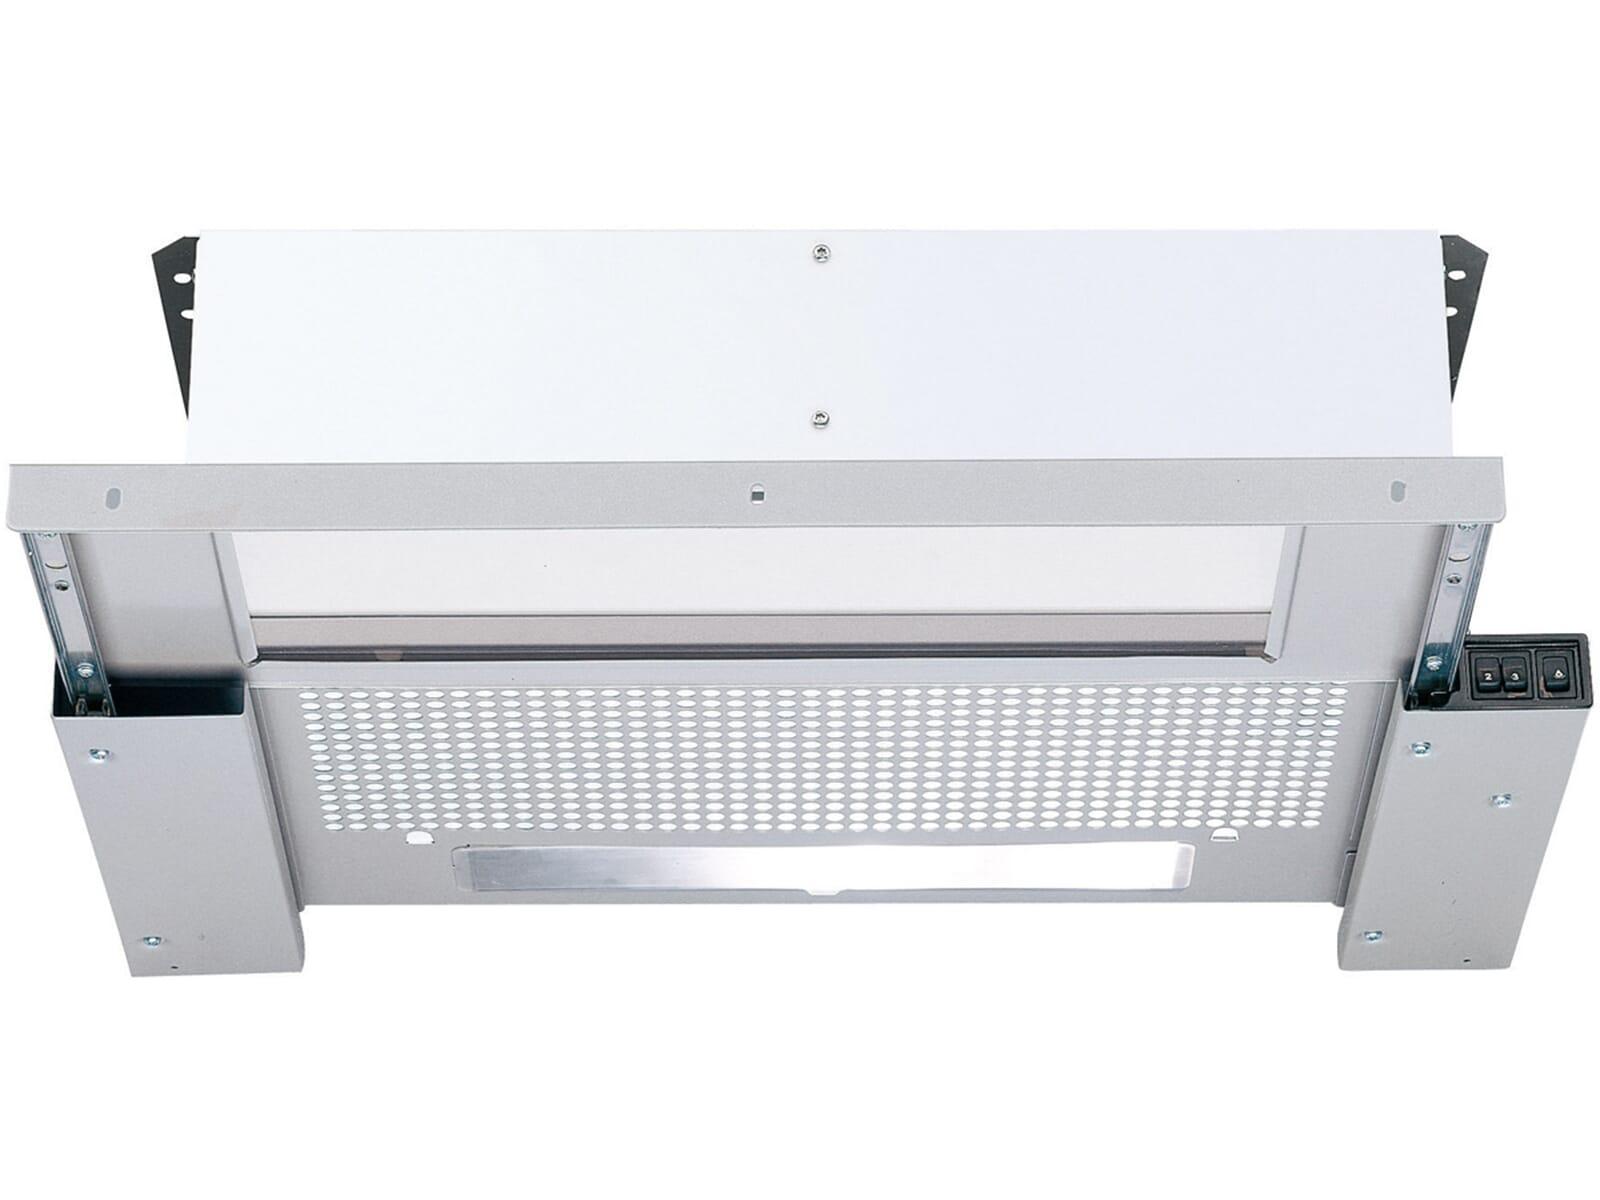 siemens li12030 flachschirm dunsthaube silbermetallic. Black Bedroom Furniture Sets. Home Design Ideas